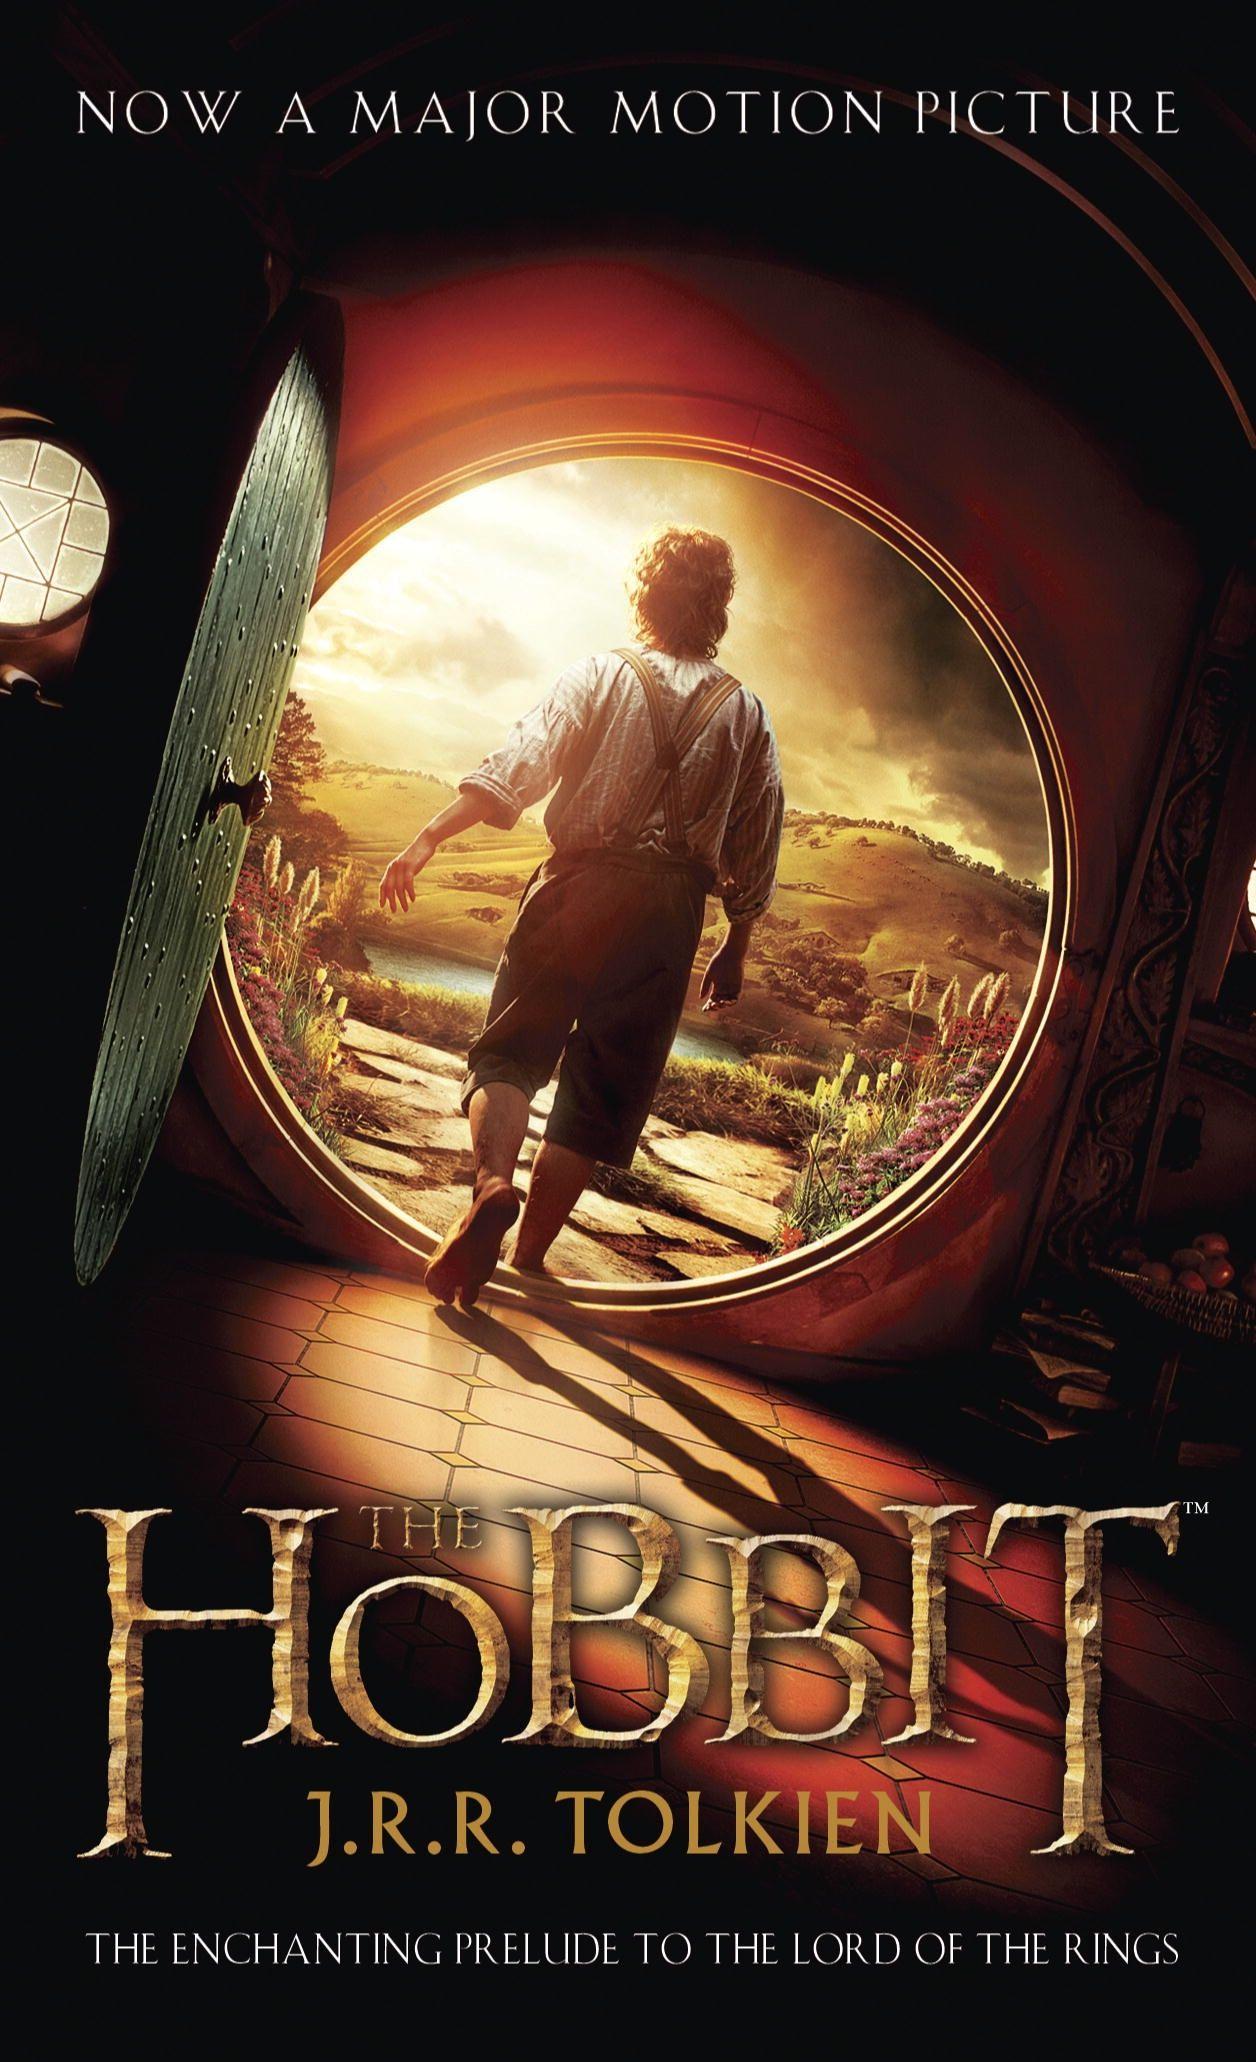 The Hobbit Portadas De Películas Hobbit Peliculas